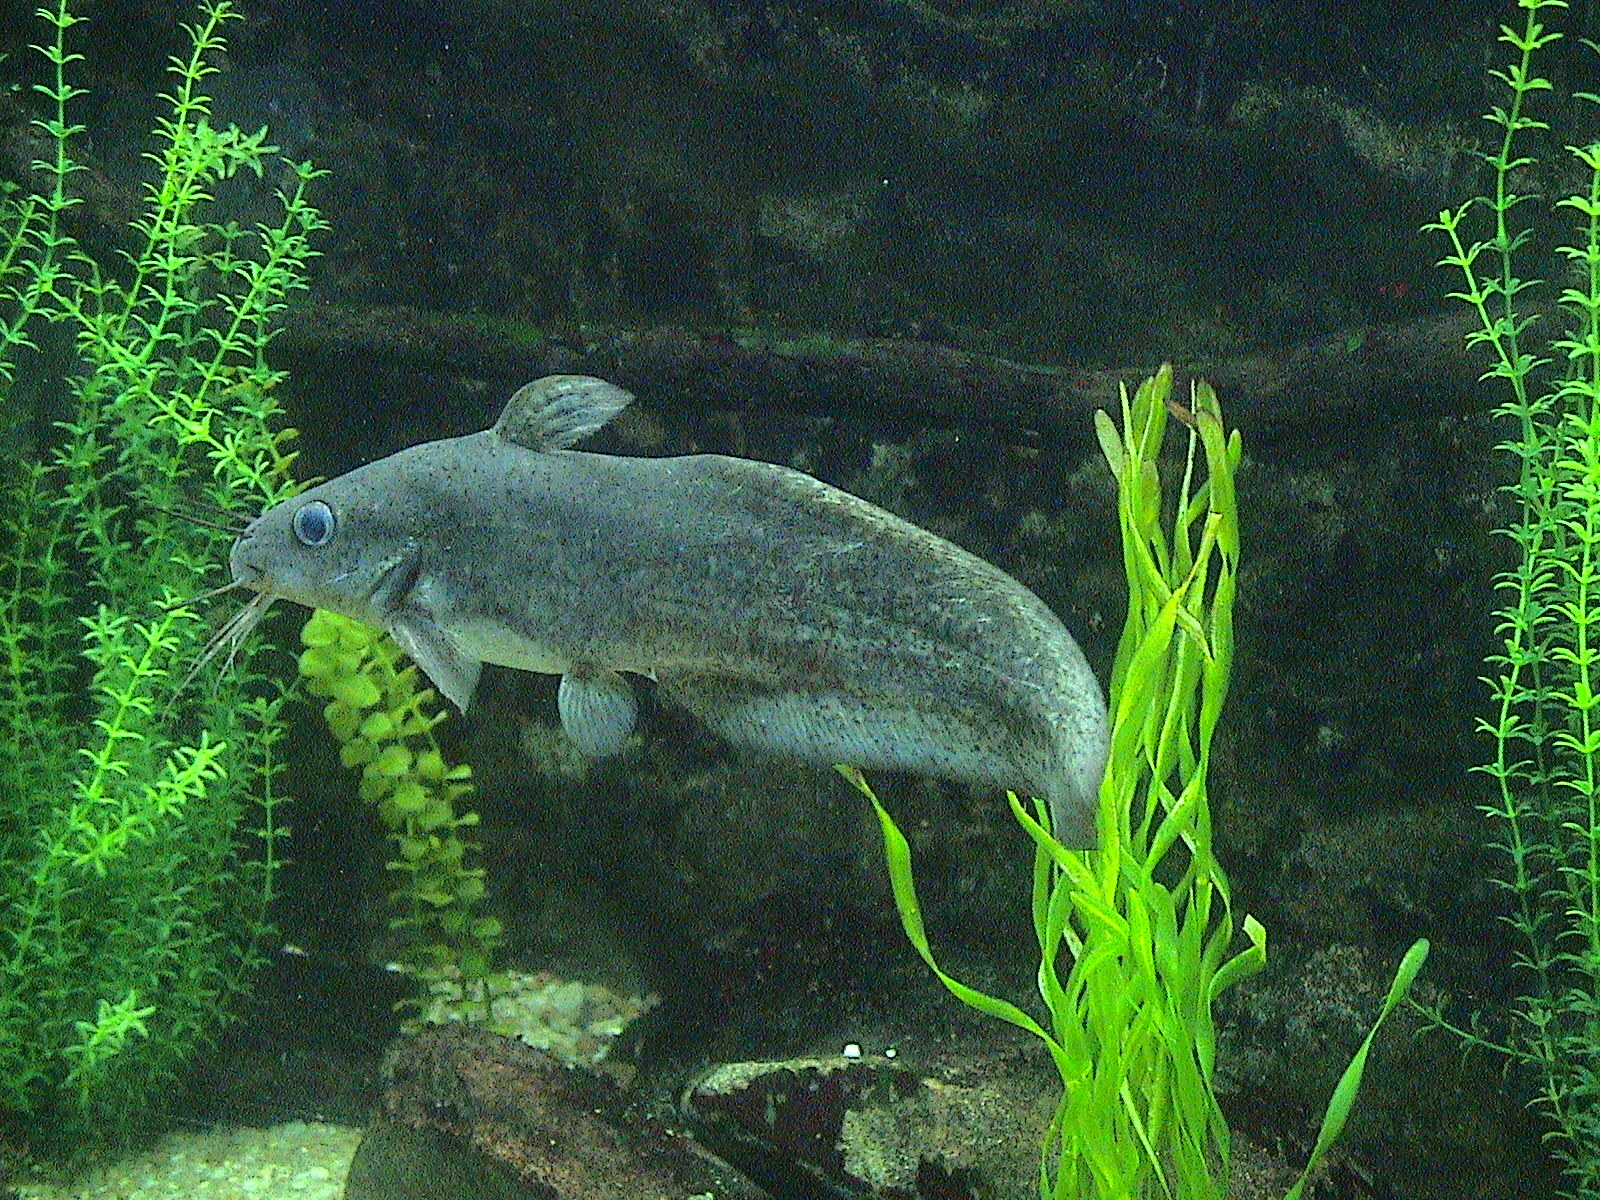 Image of Eel-tailed catfish